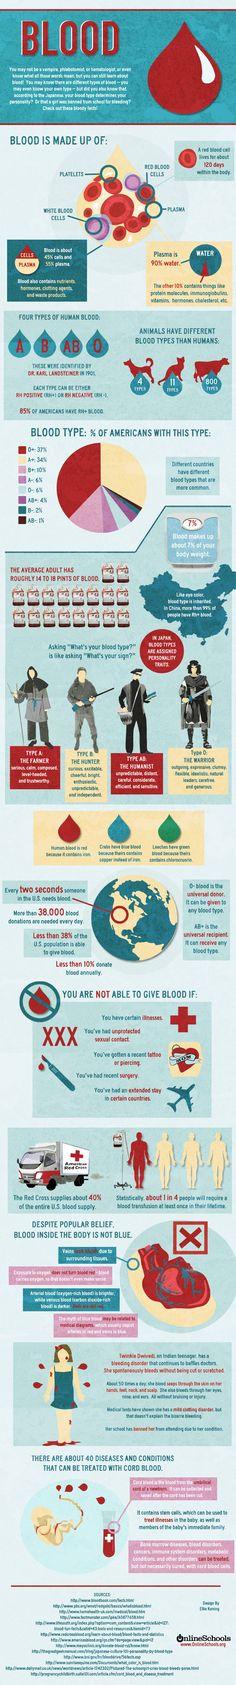 Save three lives; donate blood